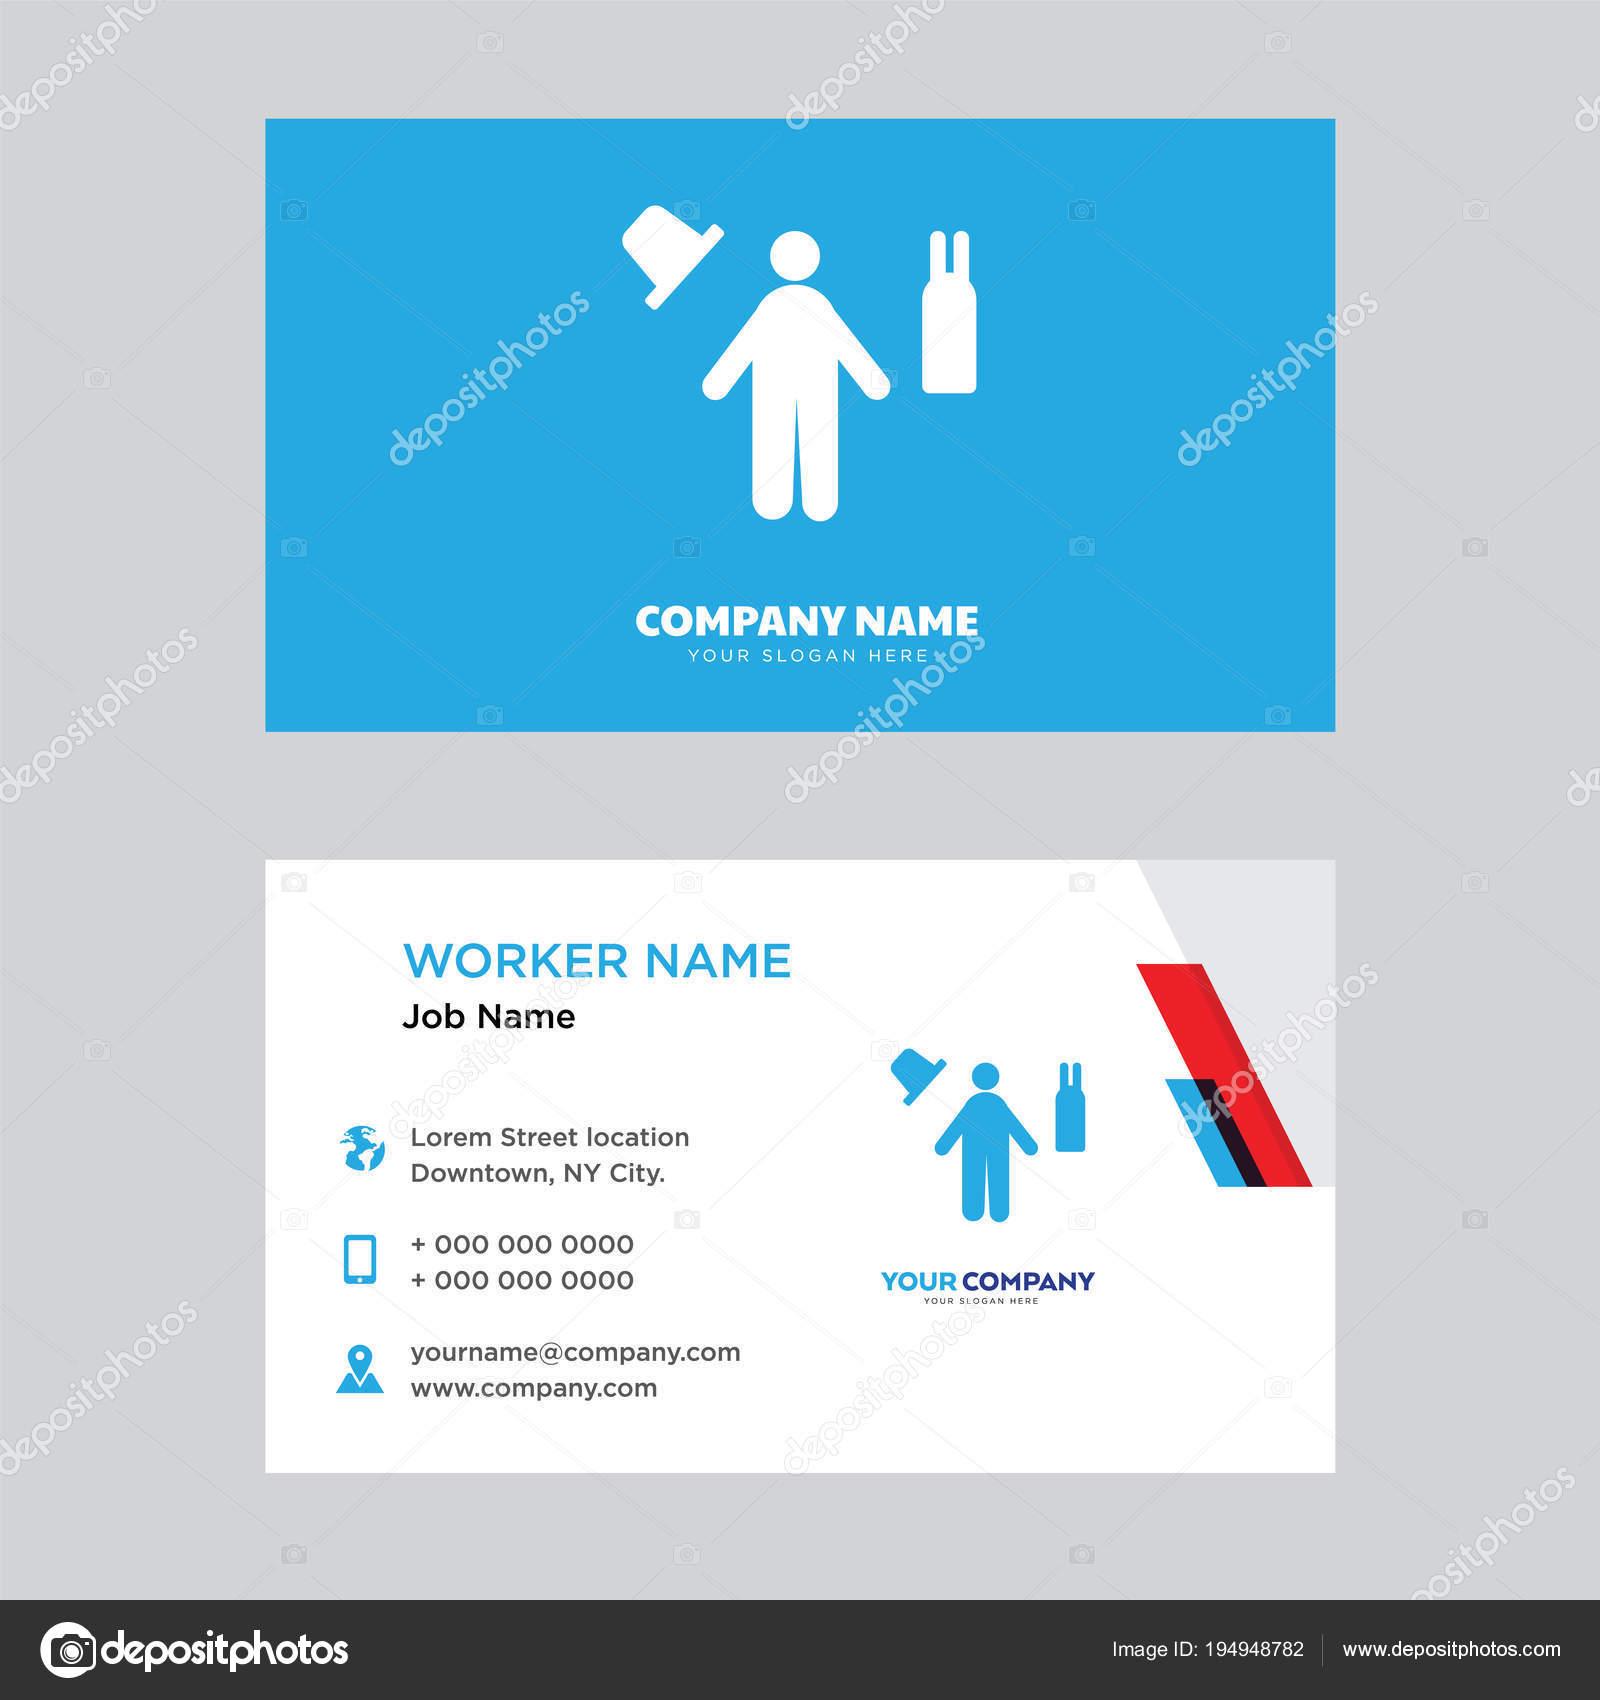 Magician business card design — Stock Vector © vector_best #194948782